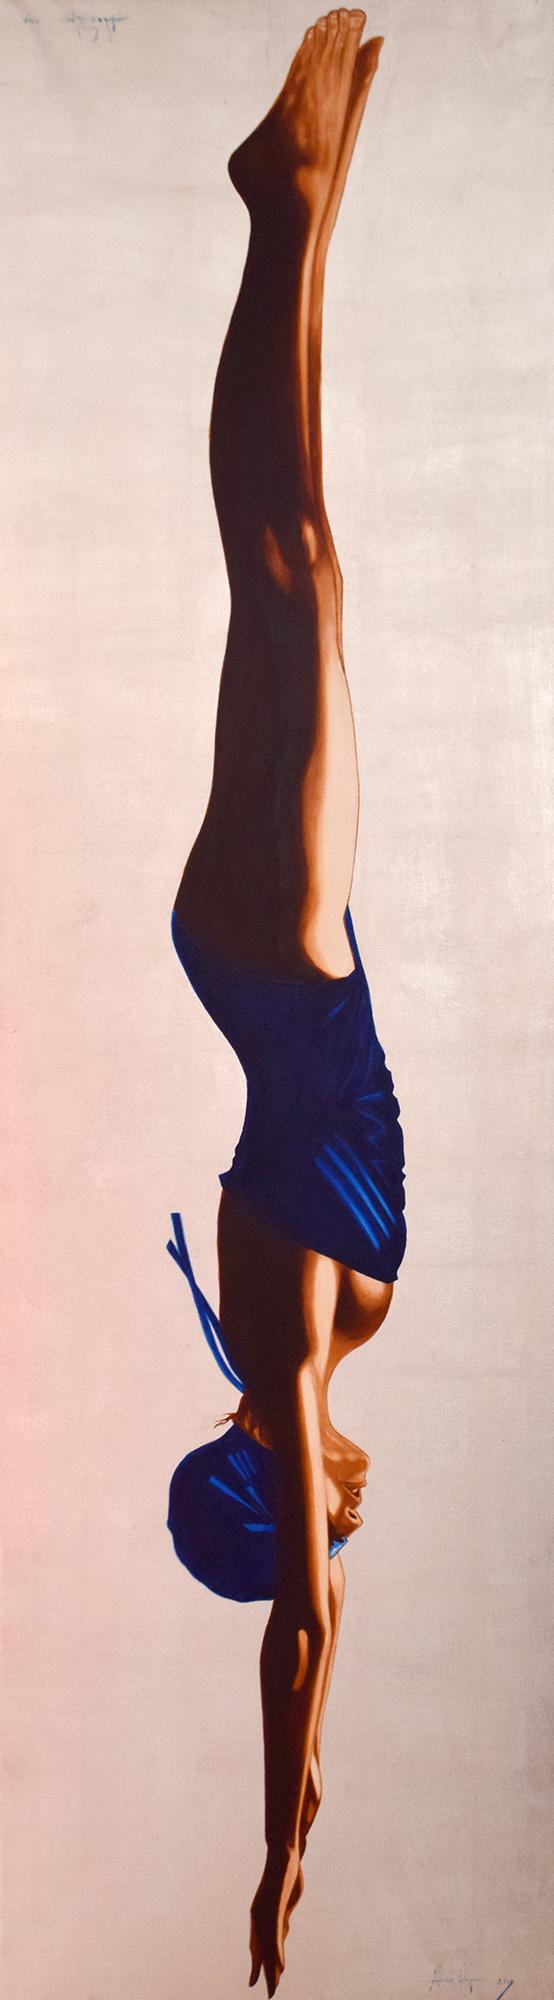 Adam Pete - Jump (Blau & Silber) , 7844-006-367